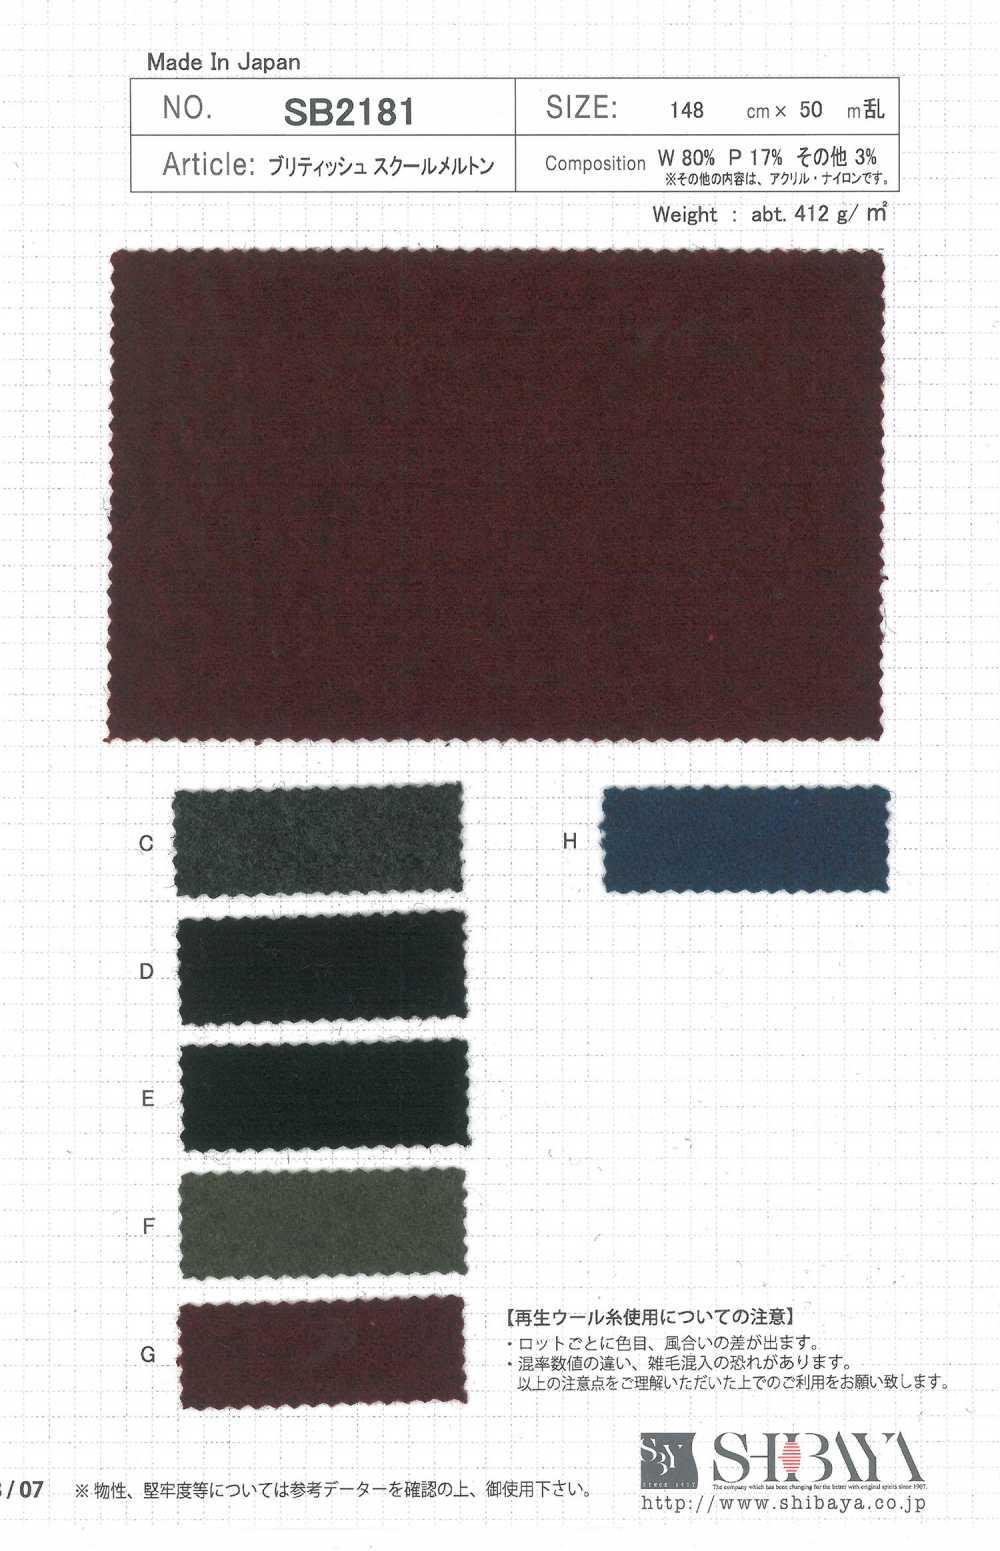 SB2181 ブリティッシュ スクールメルトン[生地] 柴屋/オークラ商事 - ApparelX アパレル資材卸通販